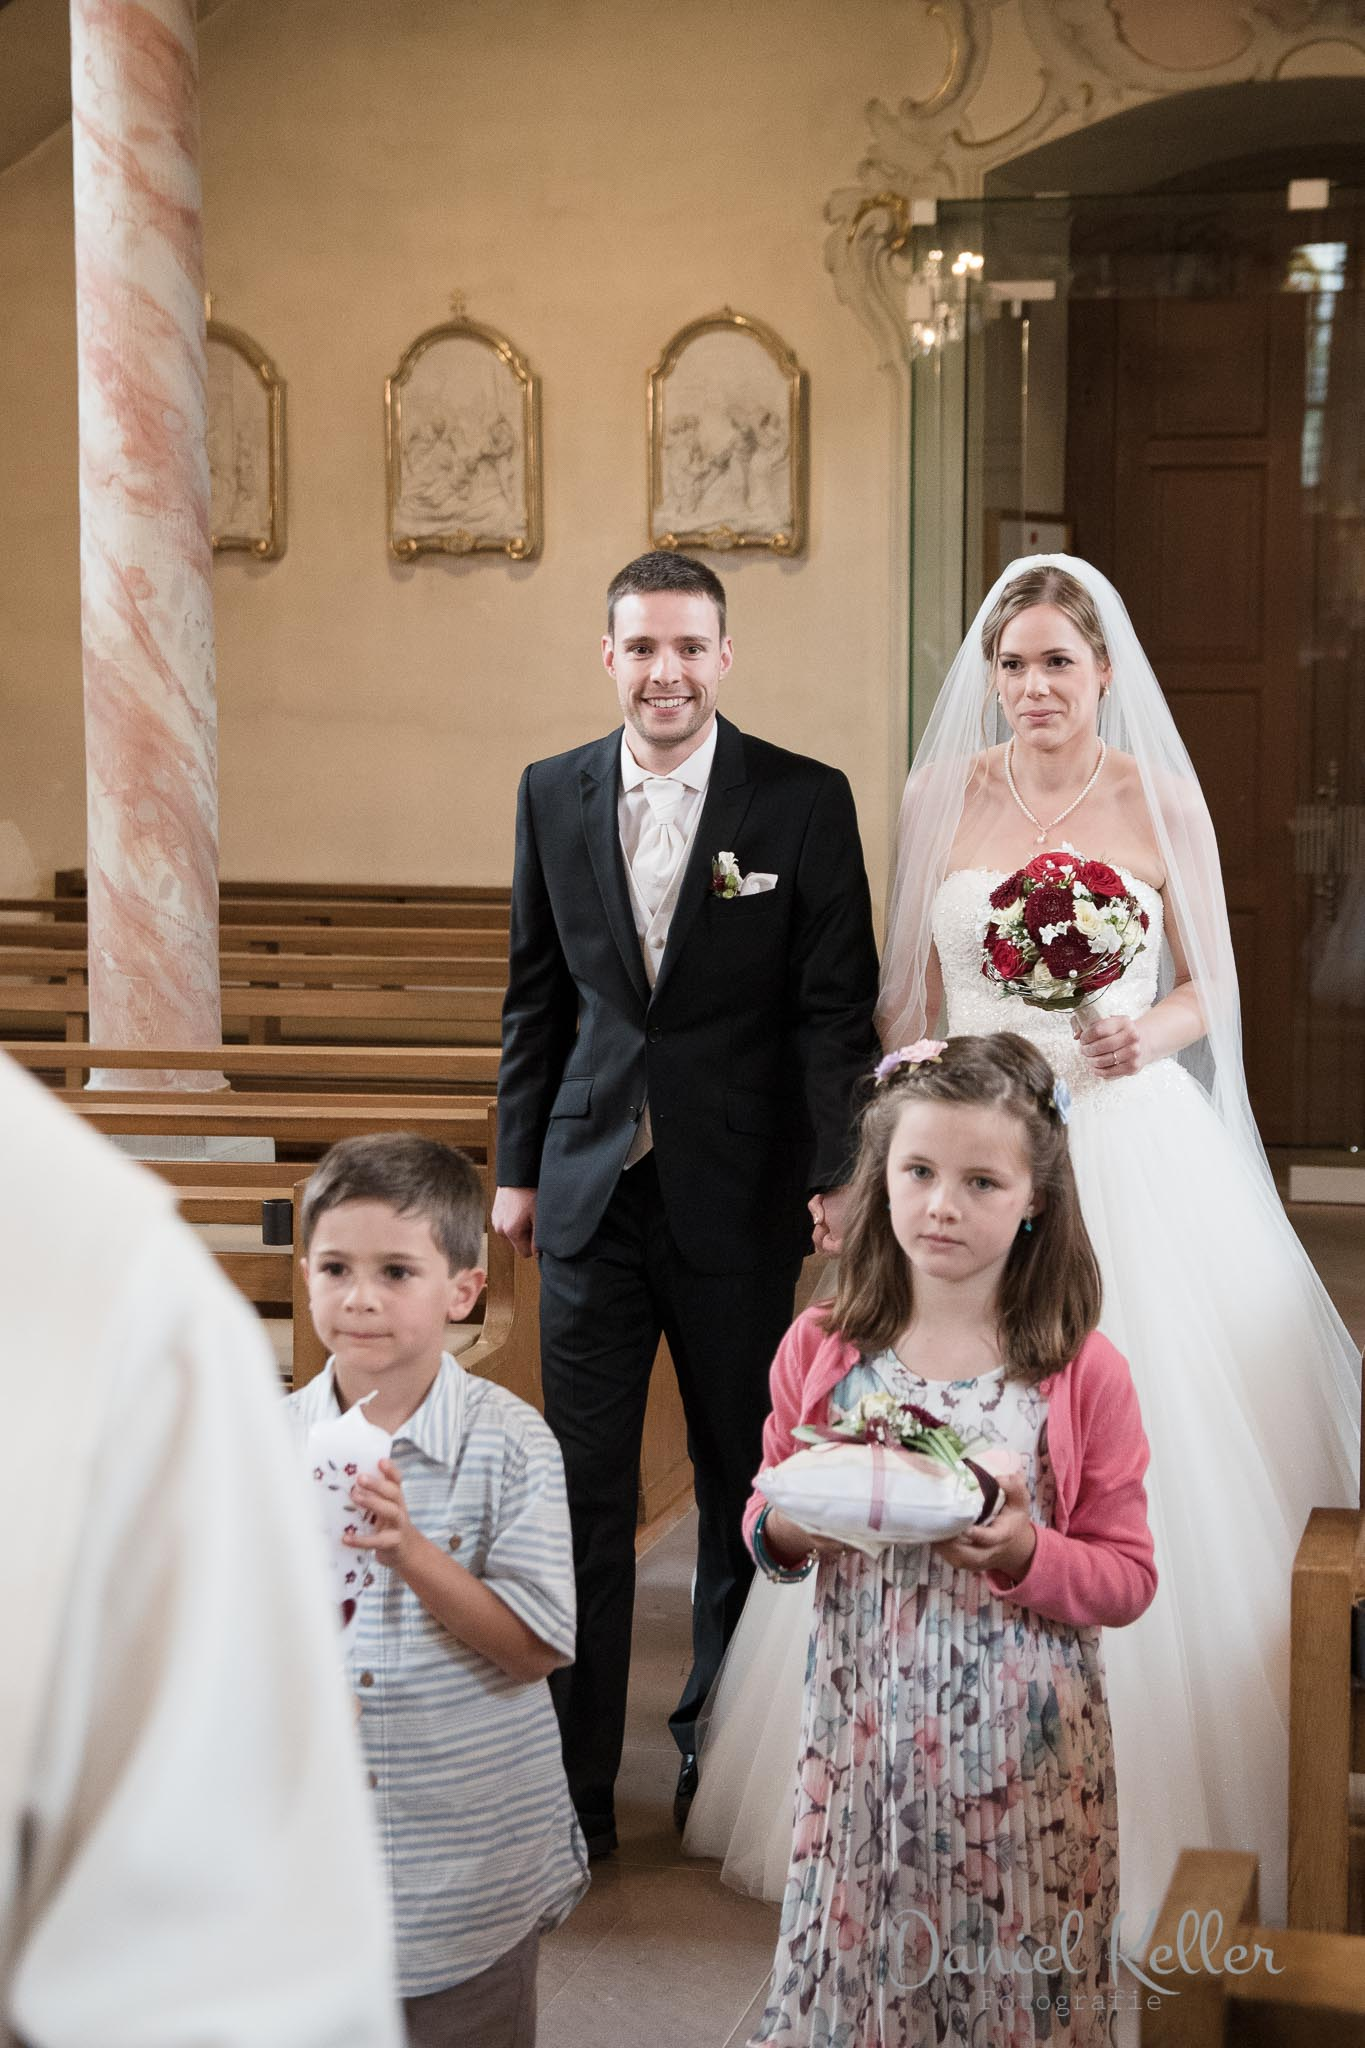 Einzug in die Kirche Appenweier / Daniel Keller Fotografie